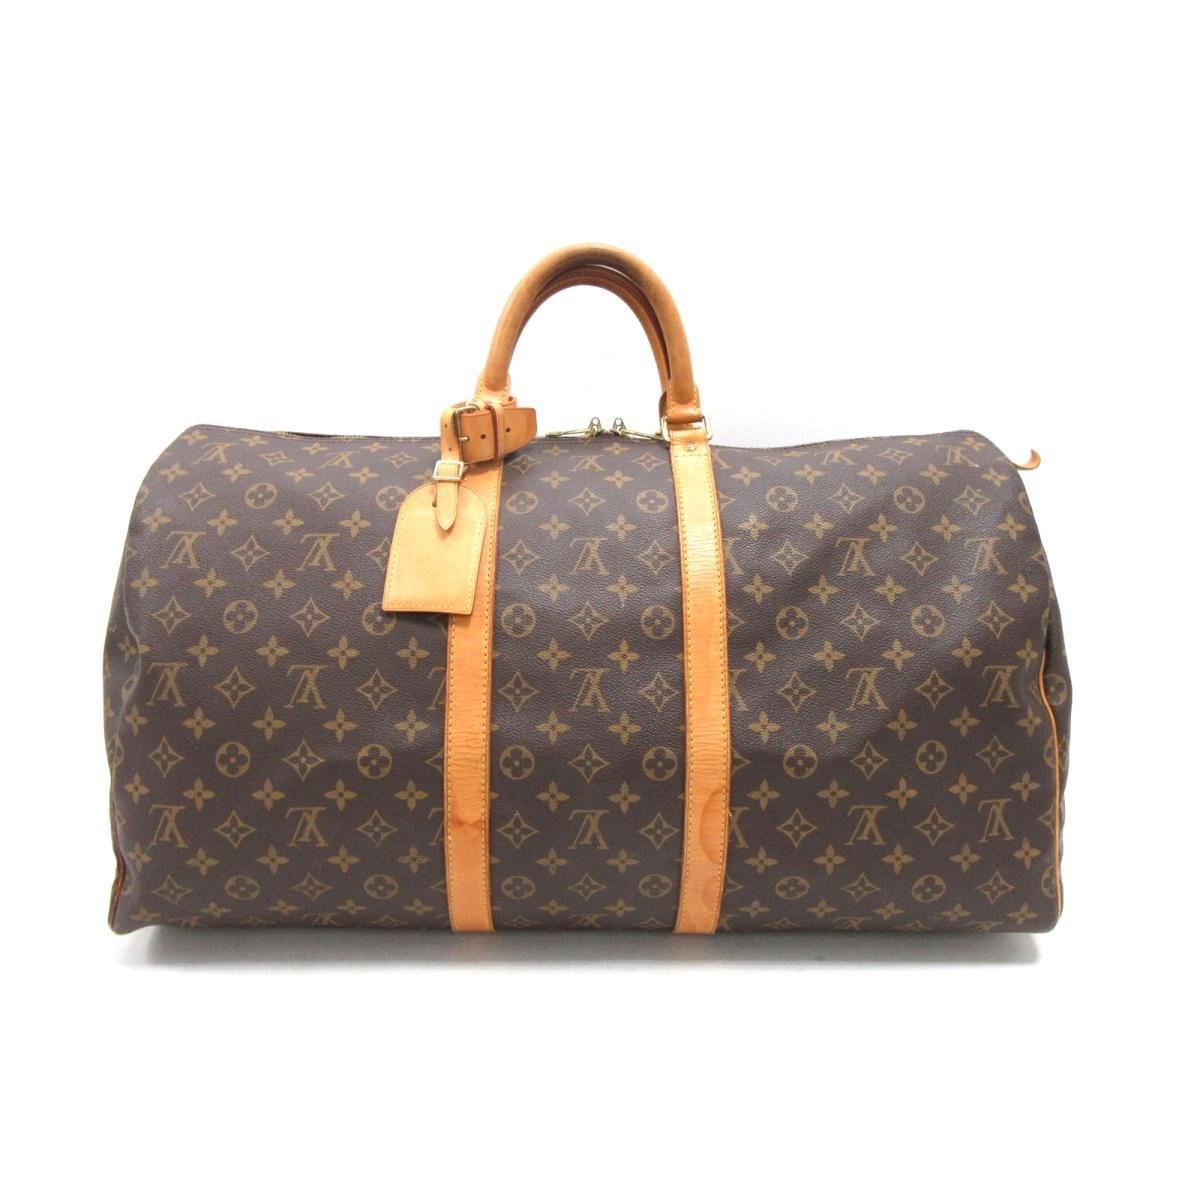 476b57b2f461 Lyst - Louis Vuitton Keepall Brown Cloth Bag in Brown for Men